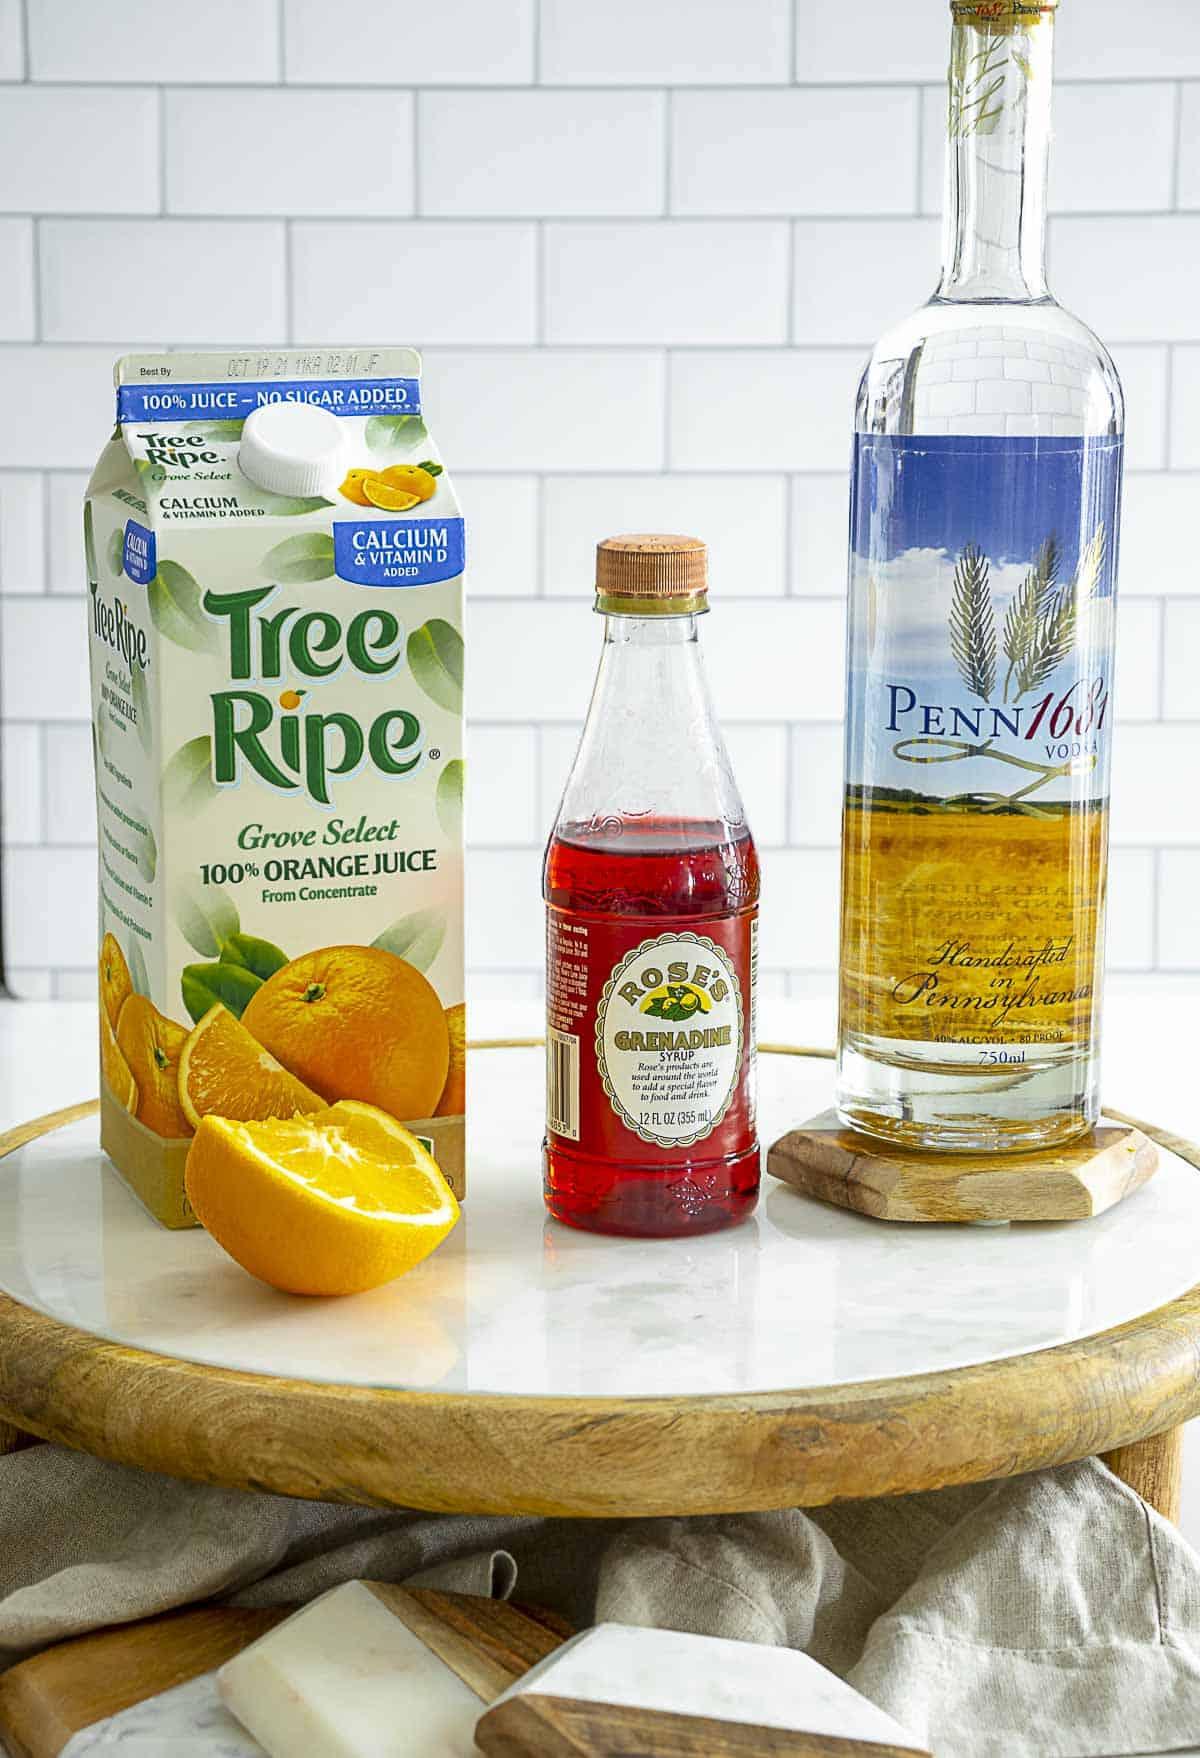 Orange juice, grenadine and vodka on table with orange.